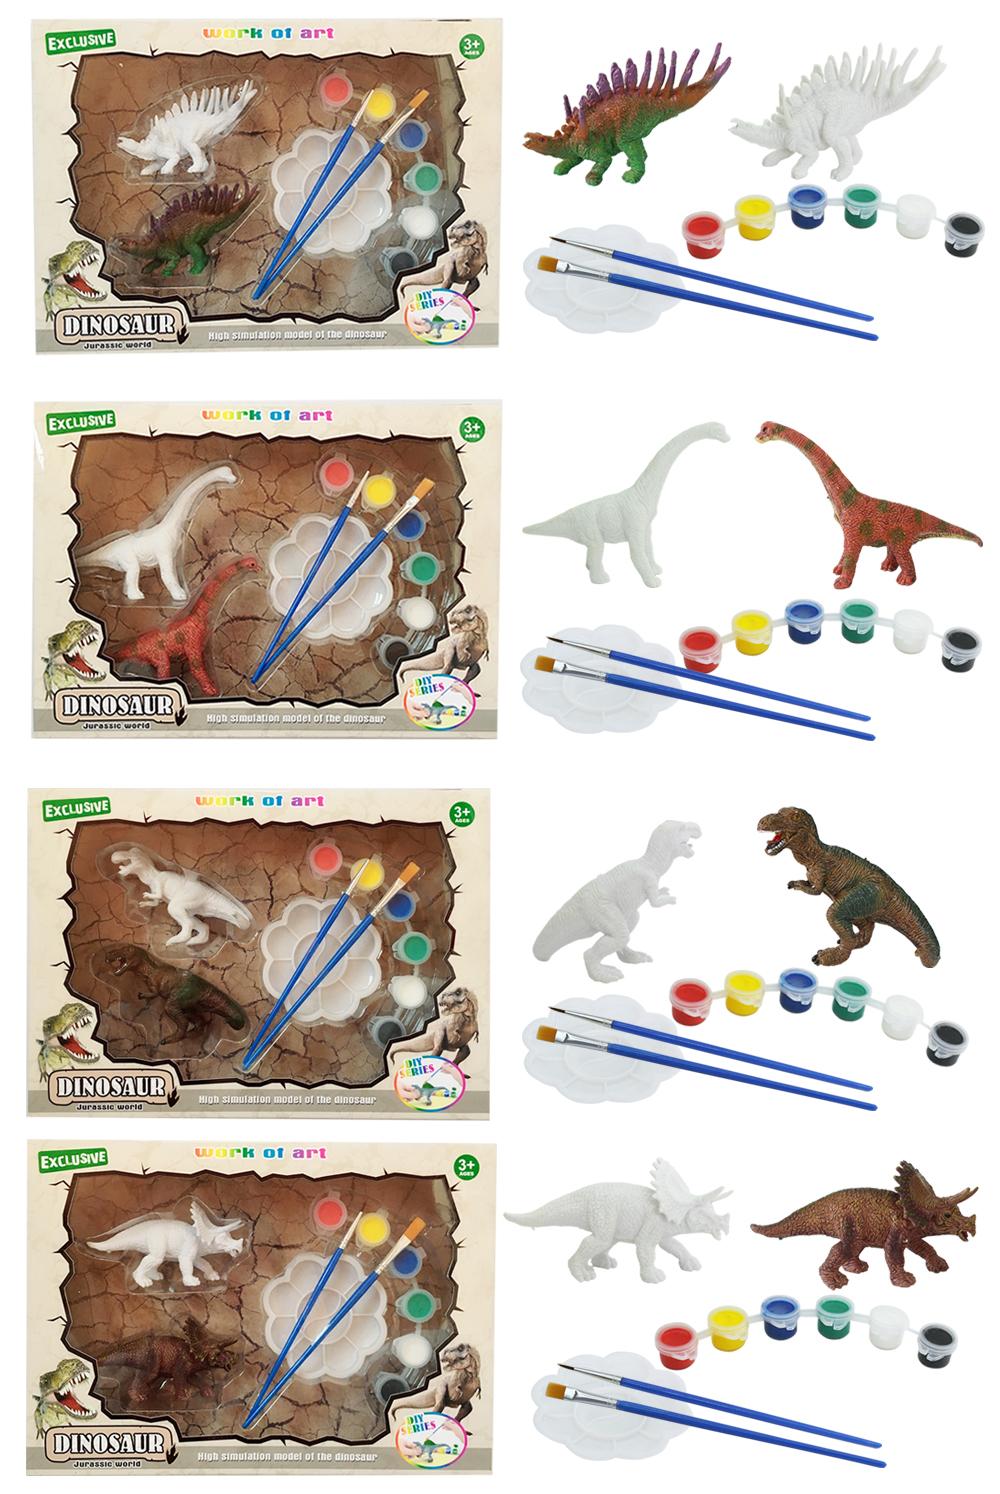 STEM educational coloring gift plastic 3d dinosaur model diy painting set children toys 2020